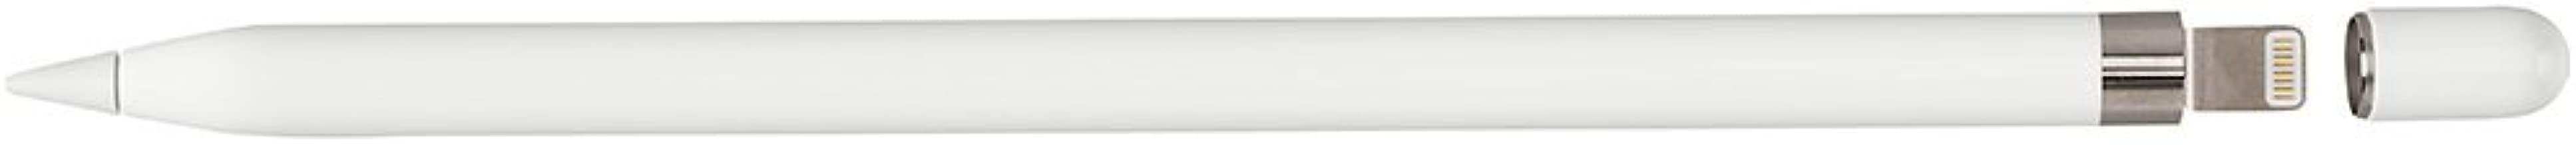 apple pencil ipad compatibility